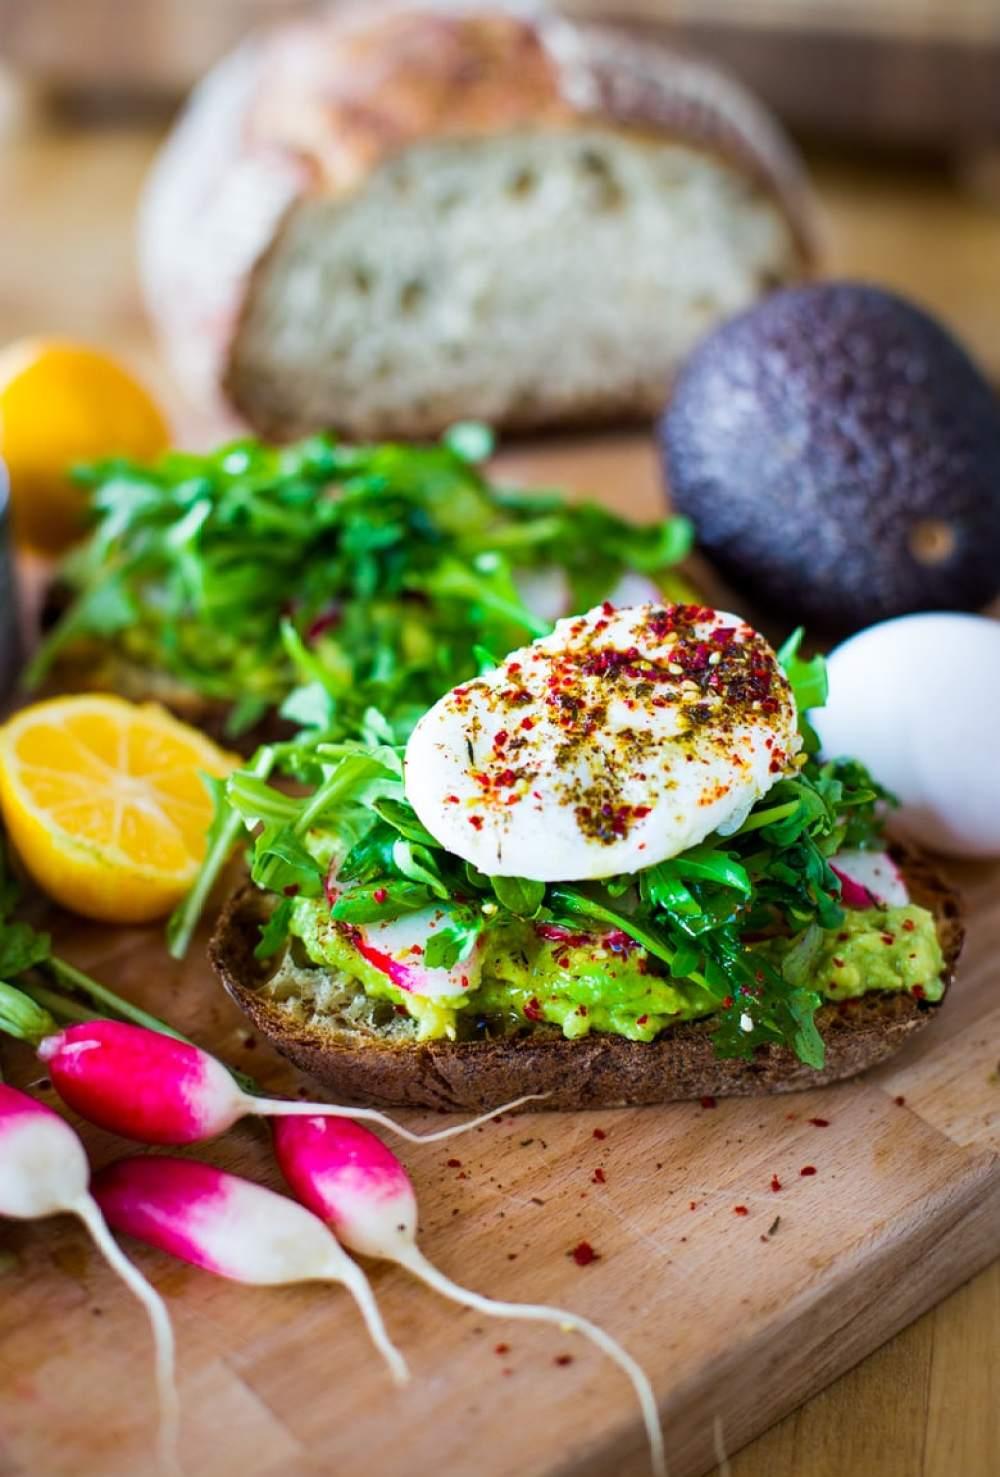 Avocado Toast with Poached Eggs, Arugula, and Zaatar